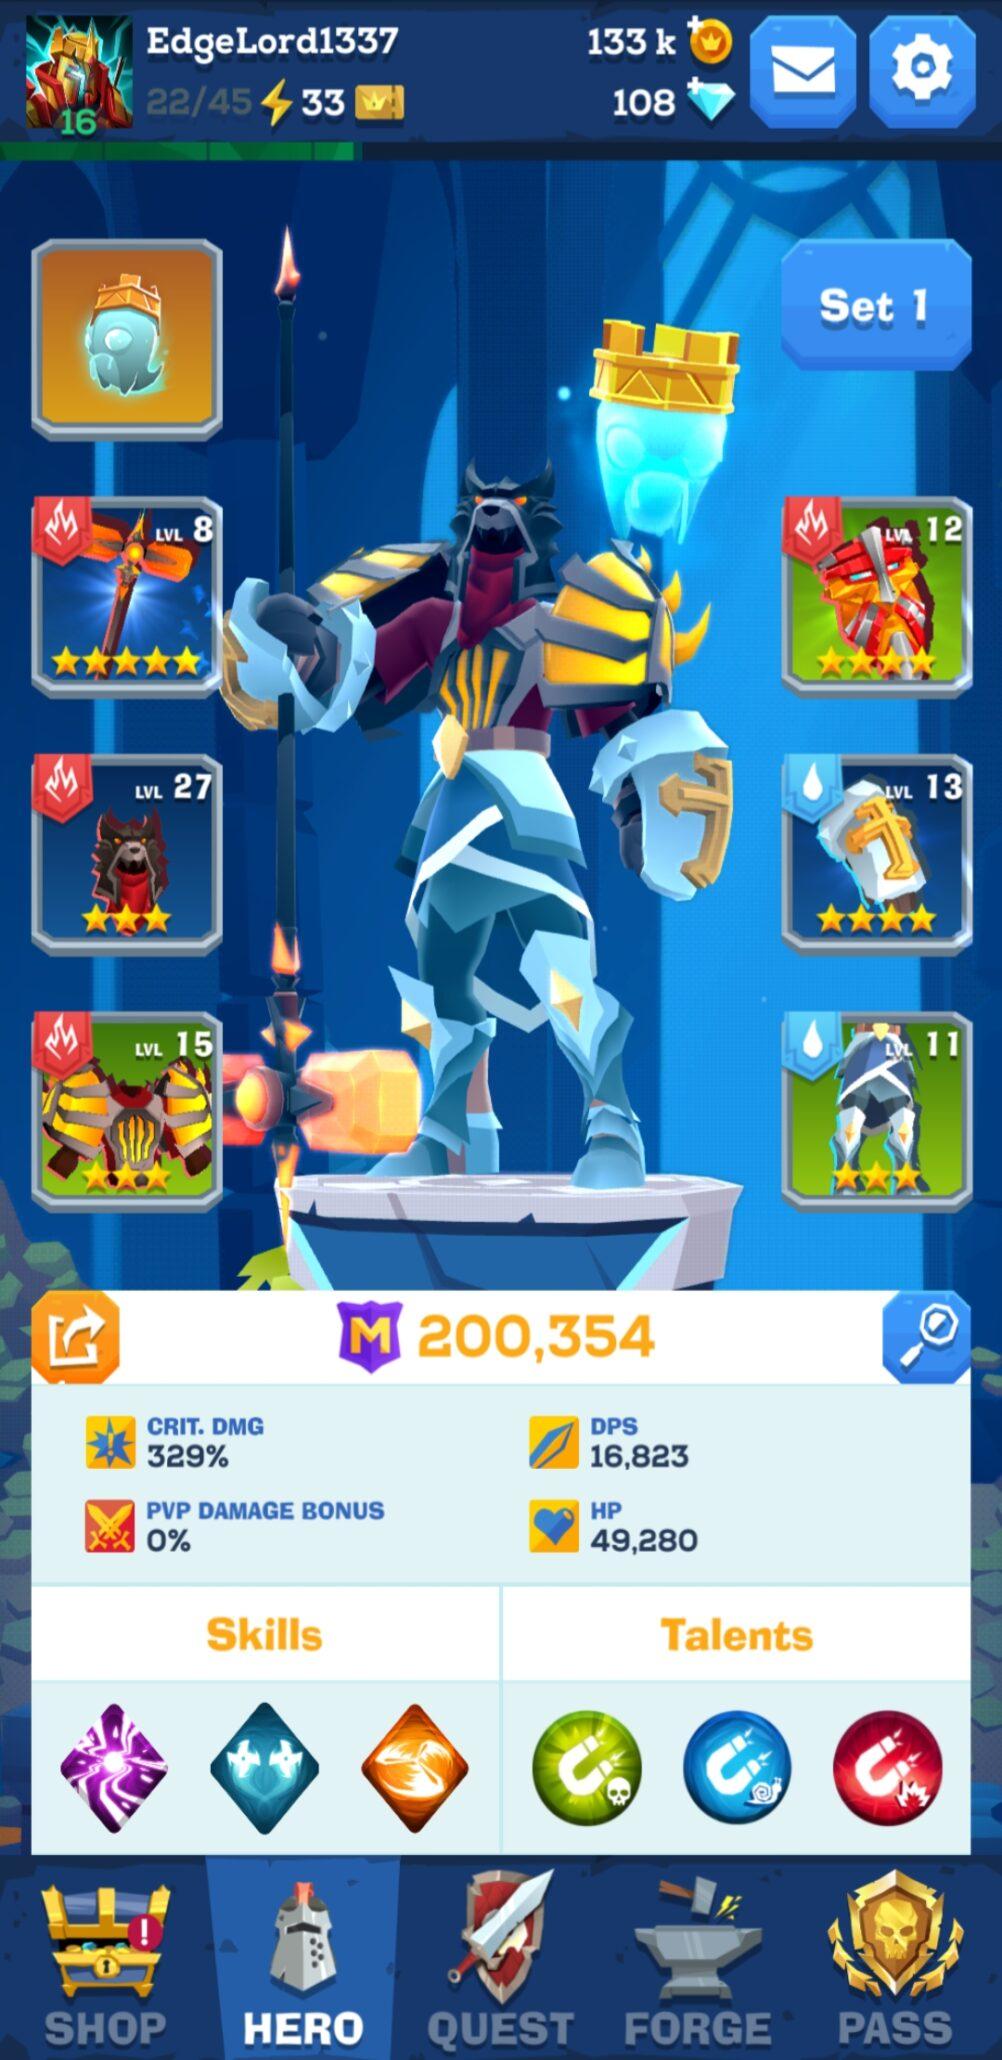 screenshot_20190721-155632_mighty-quest